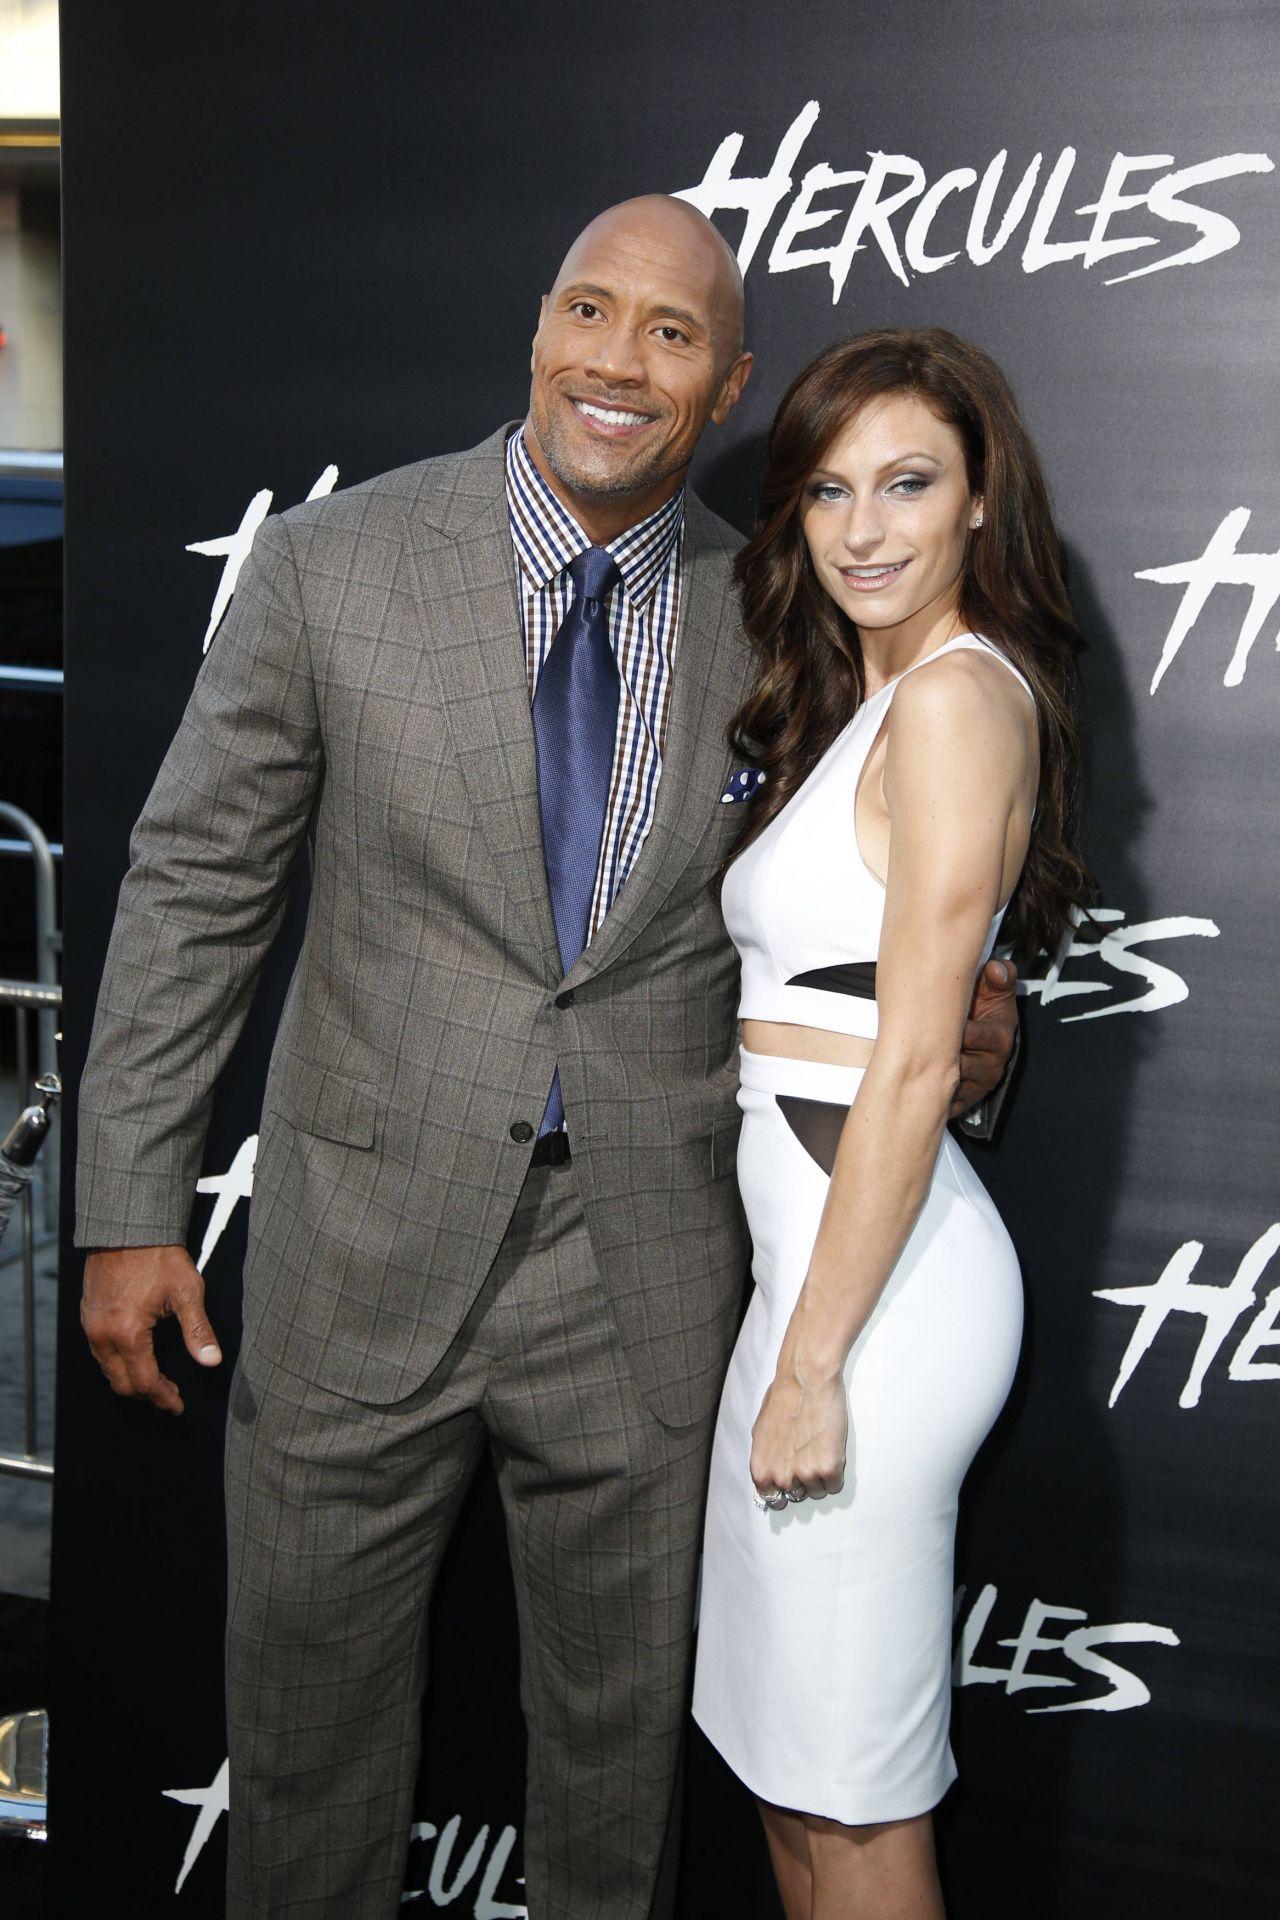 Lauren Hashian And Dwayne The Rock Johnson  Hercules -8042